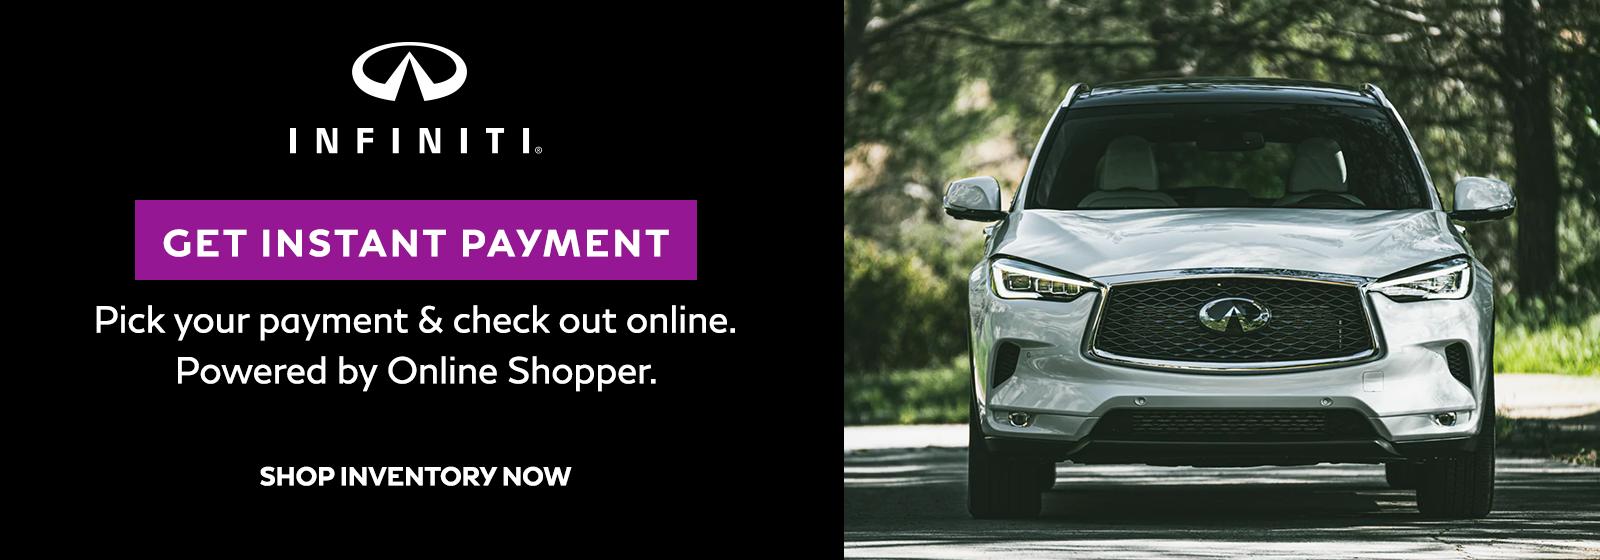 Pick Your Payment Online Shopper